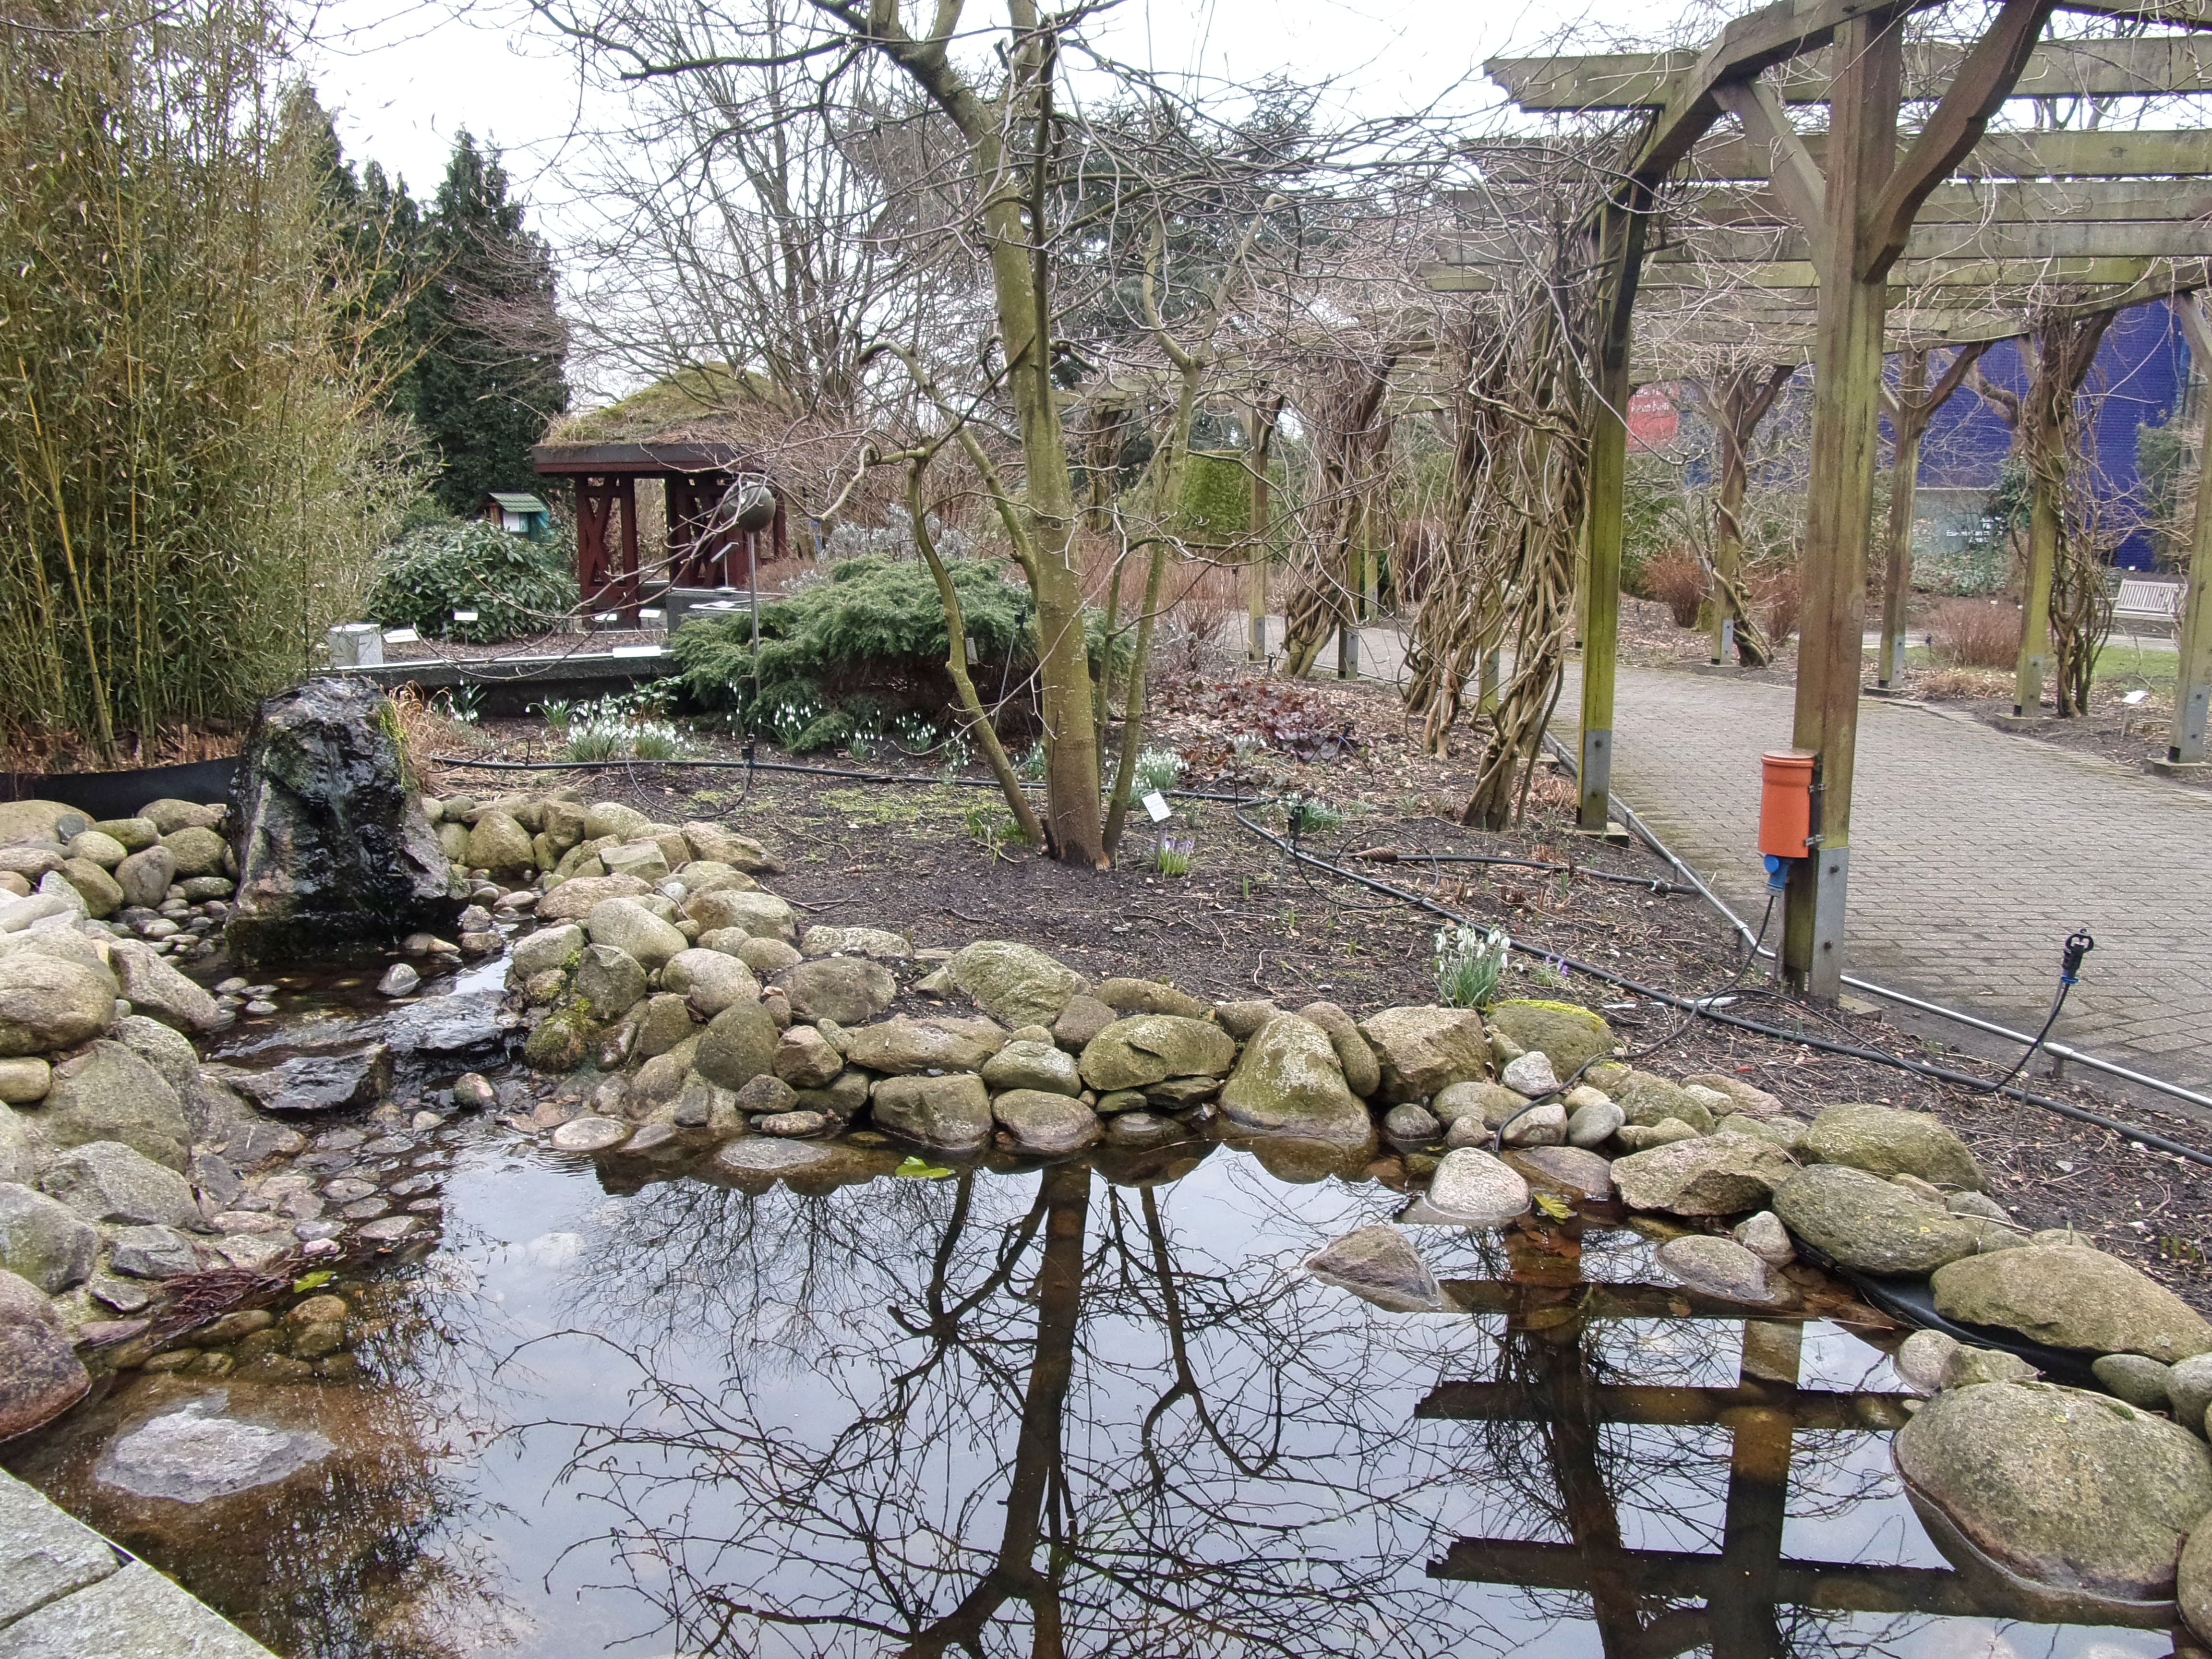 Fileloki Schmidt Garten Hh 2jpg Wikimedia Commons